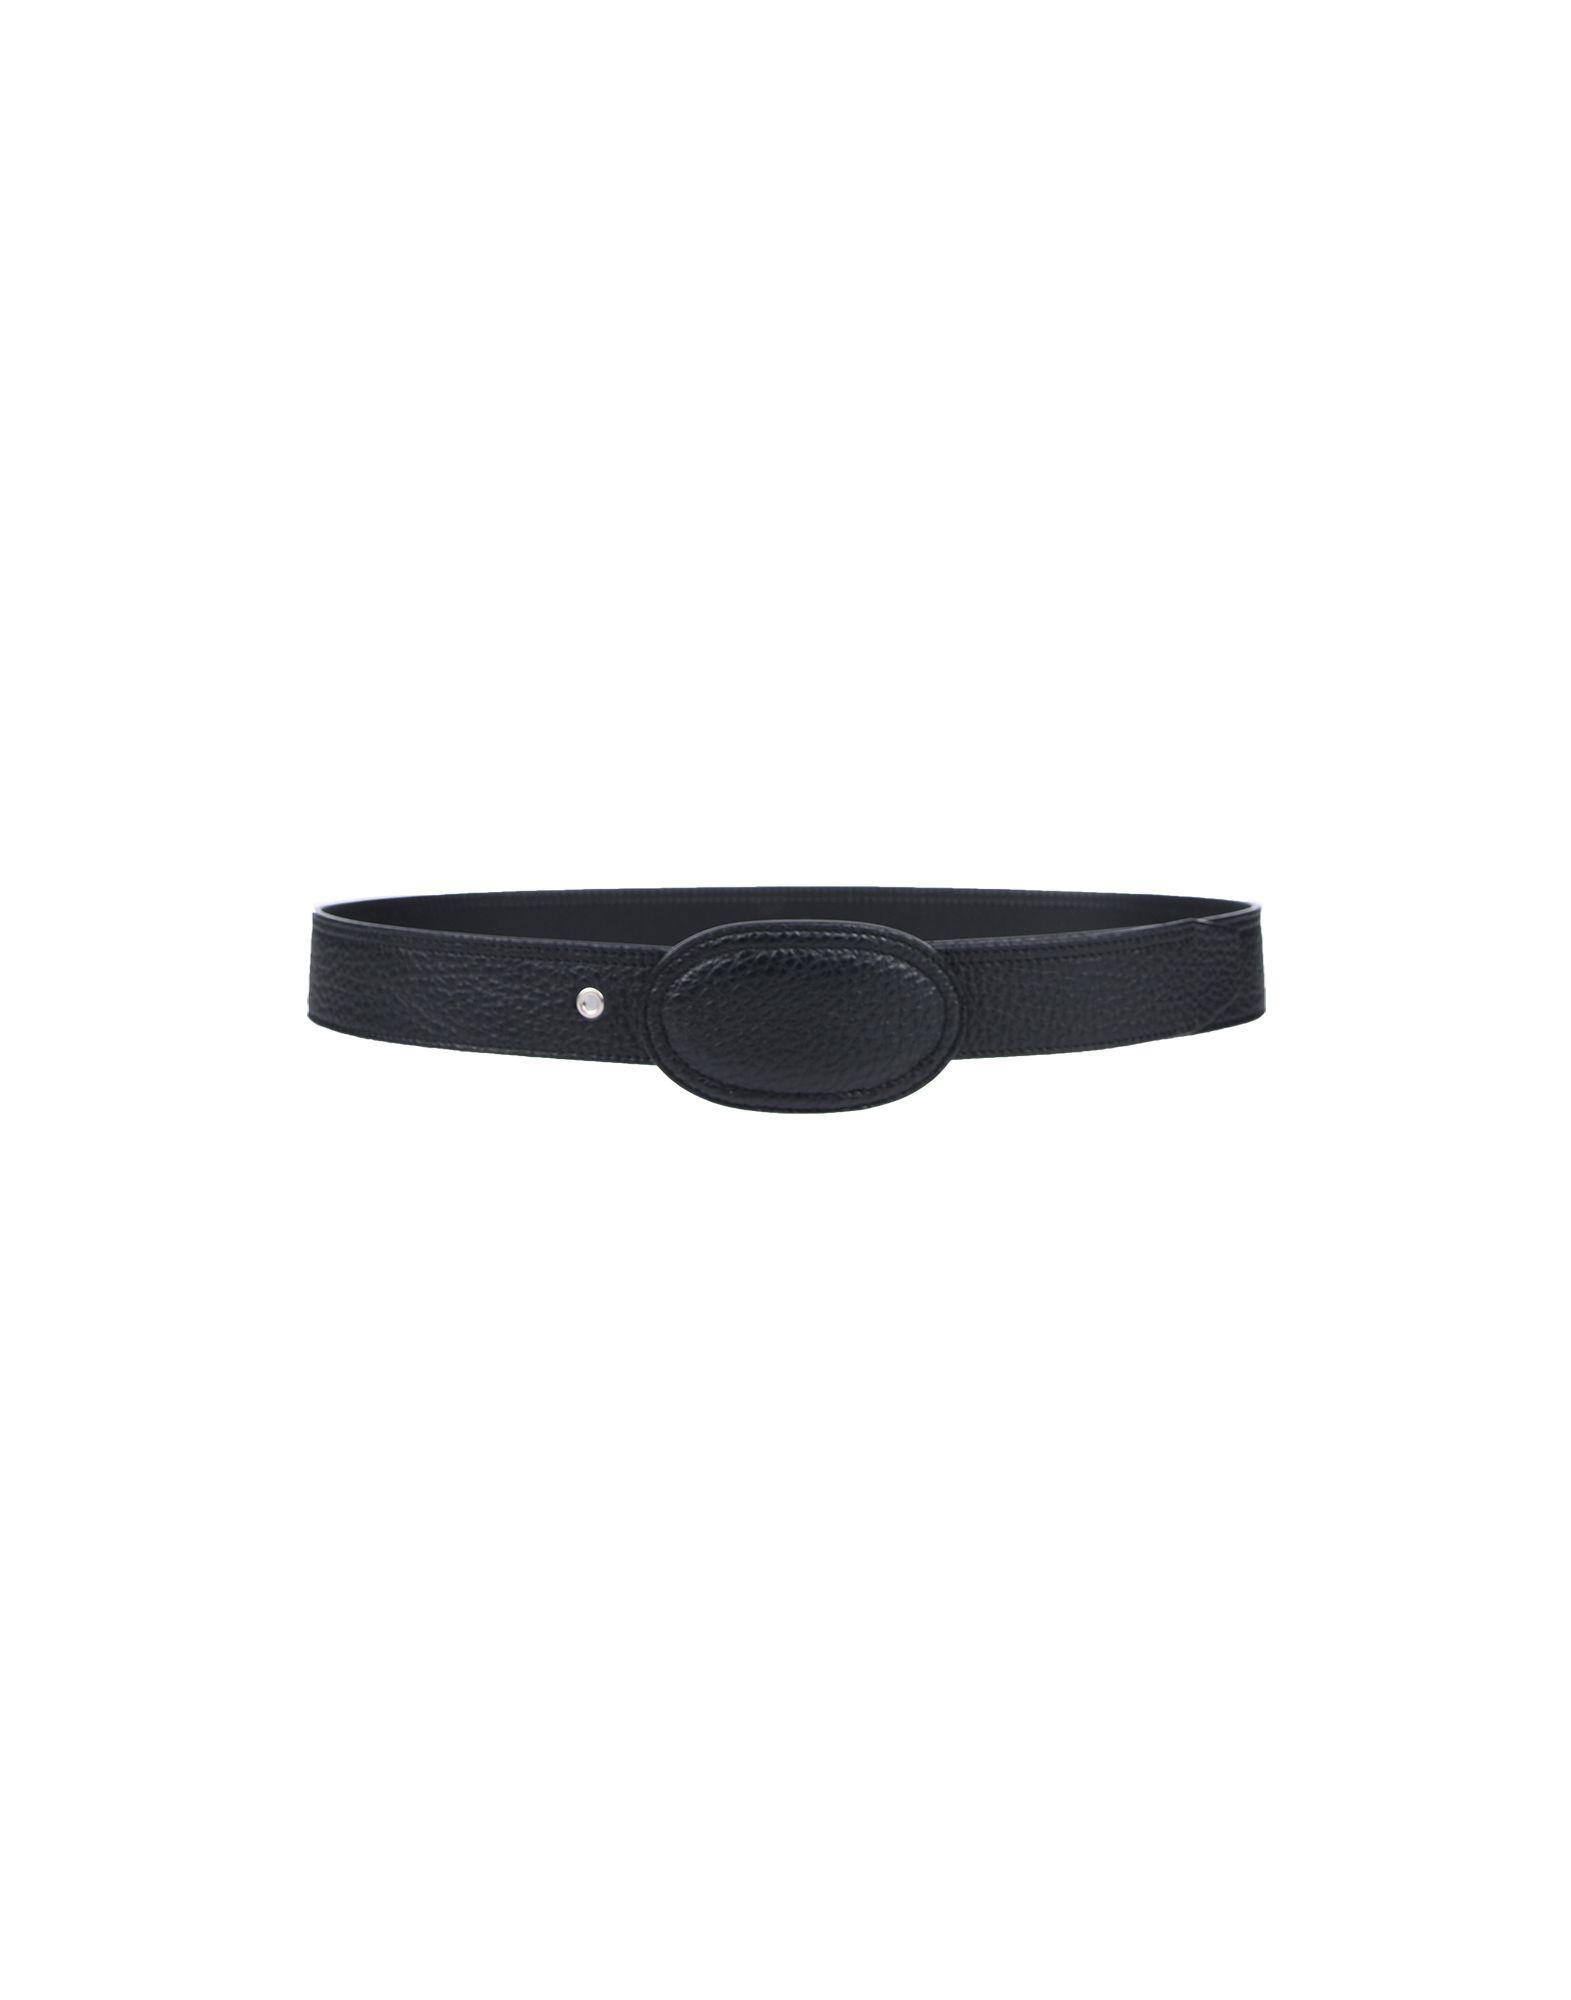 Maison Margiela Leather Belt In Black For Men Lyst